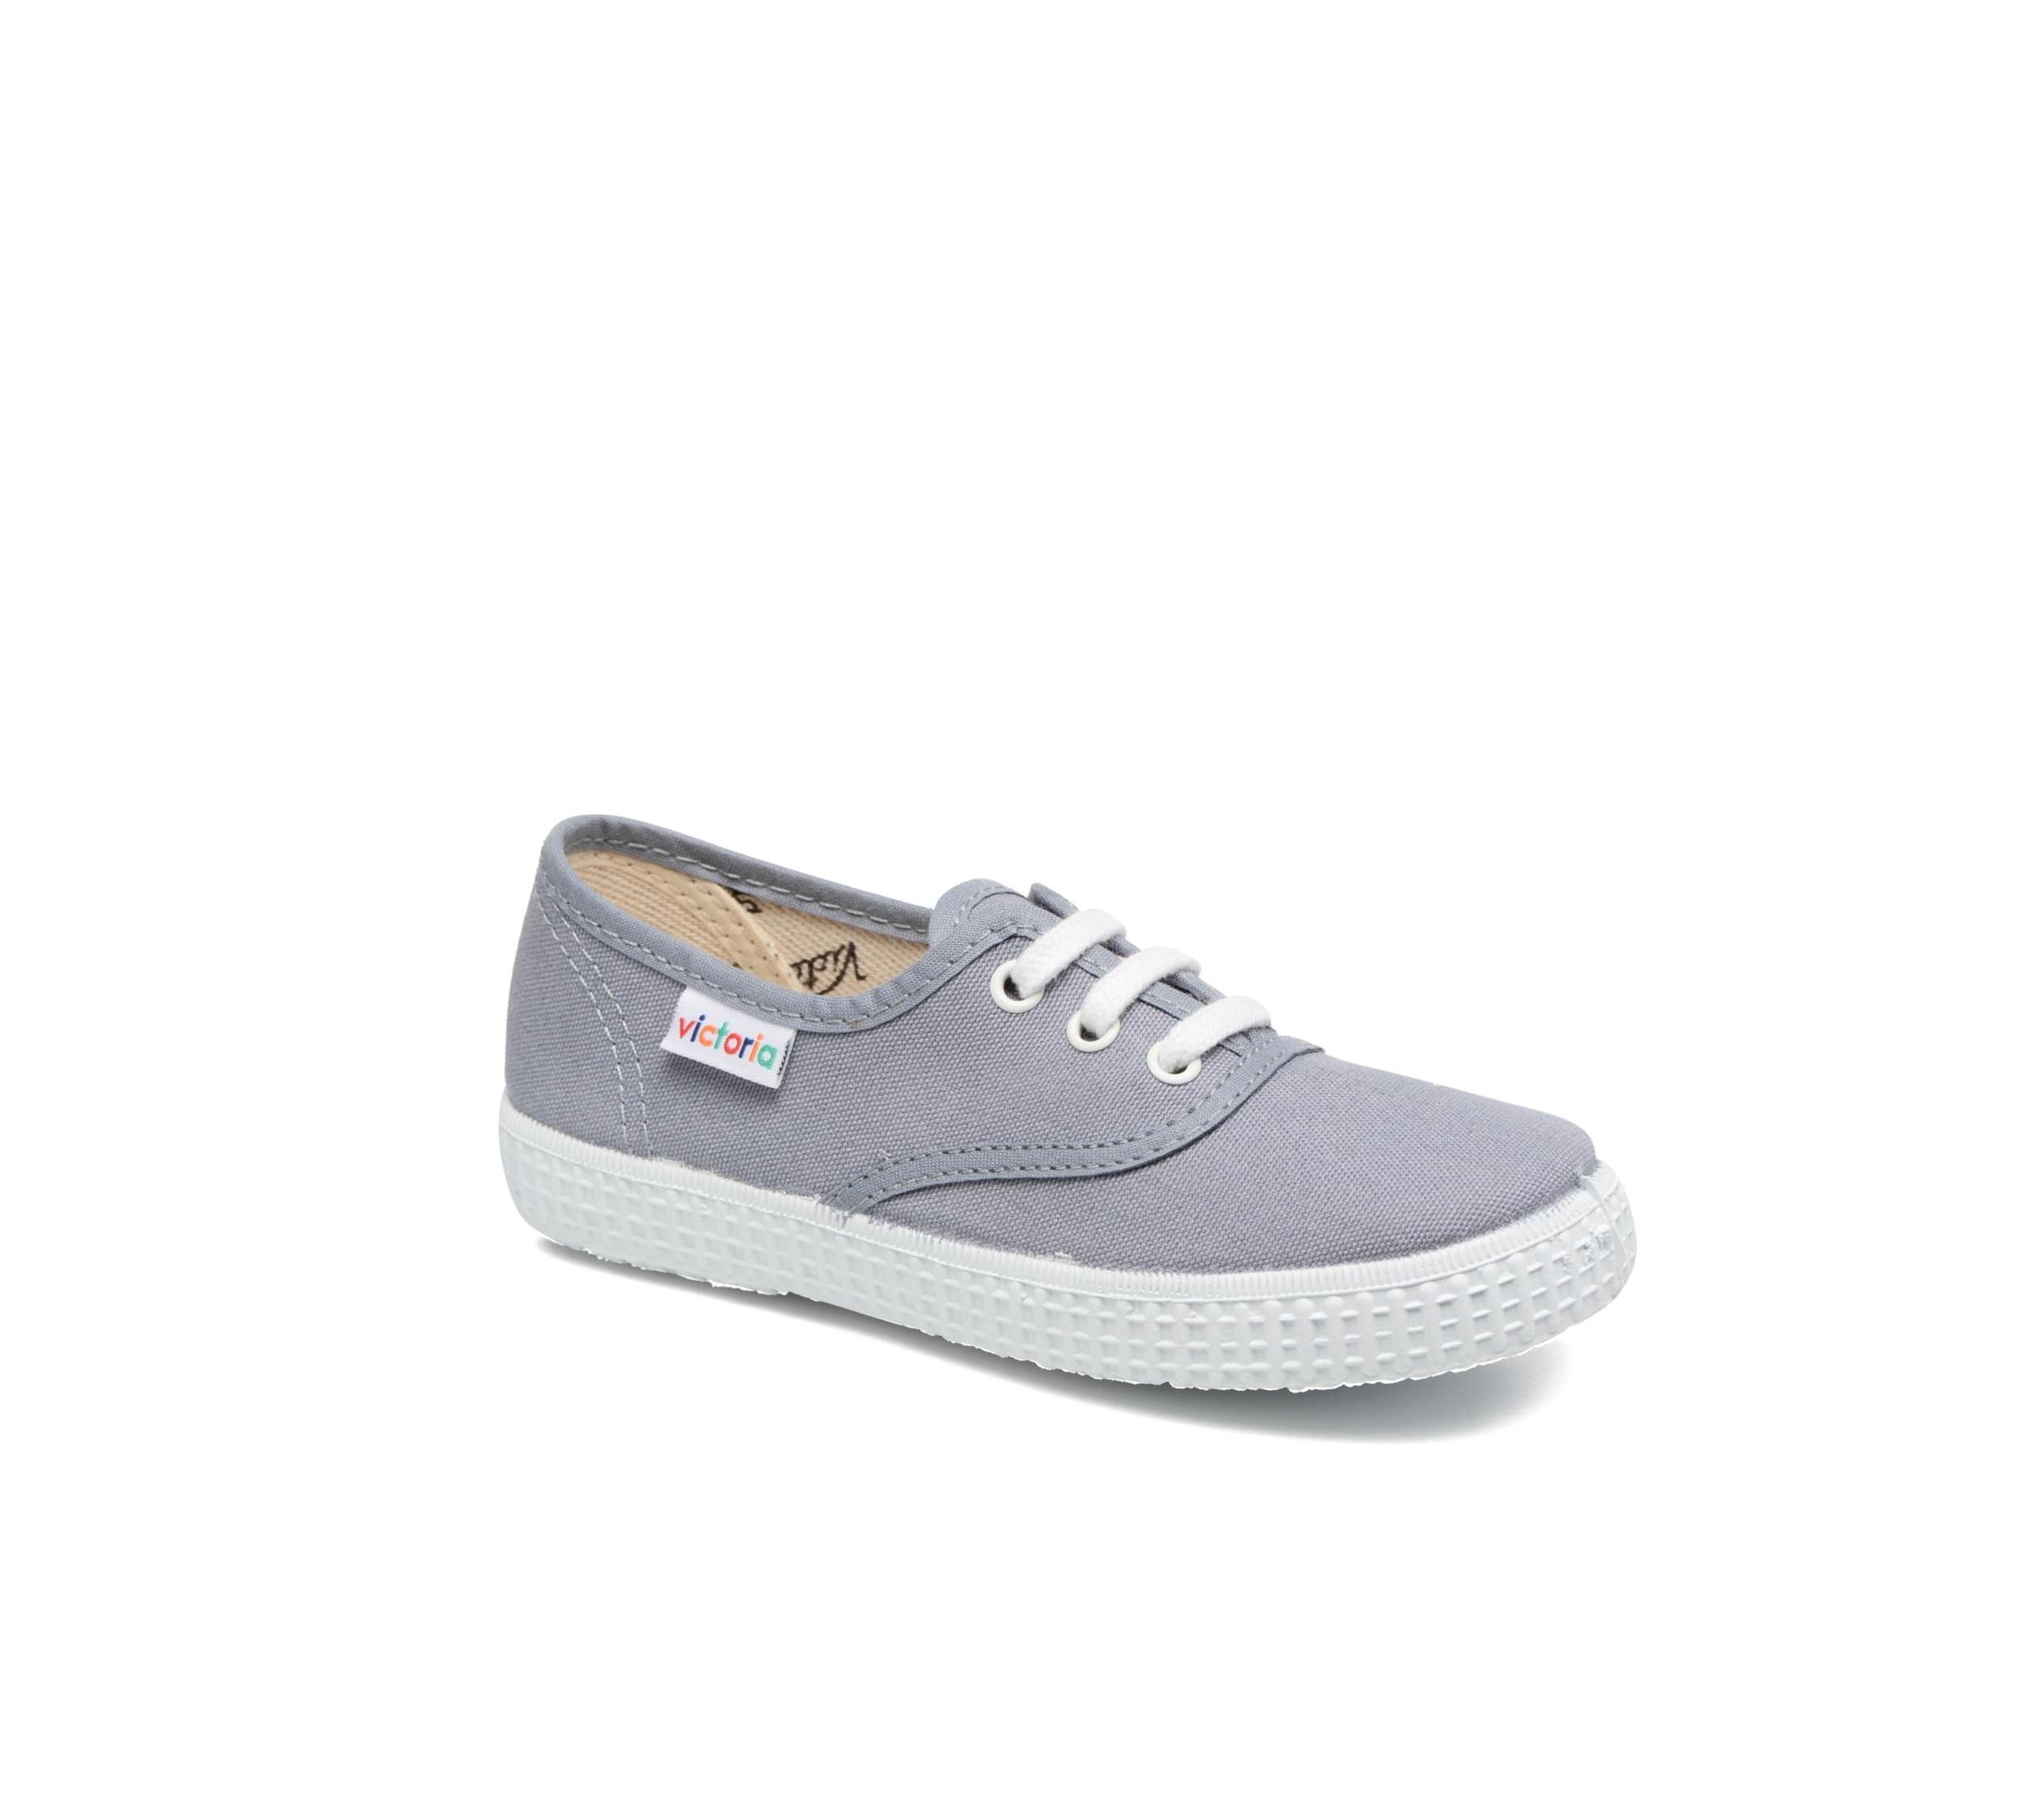 Sneakers bianche con stringhe per bambini Next iHCdlHd847